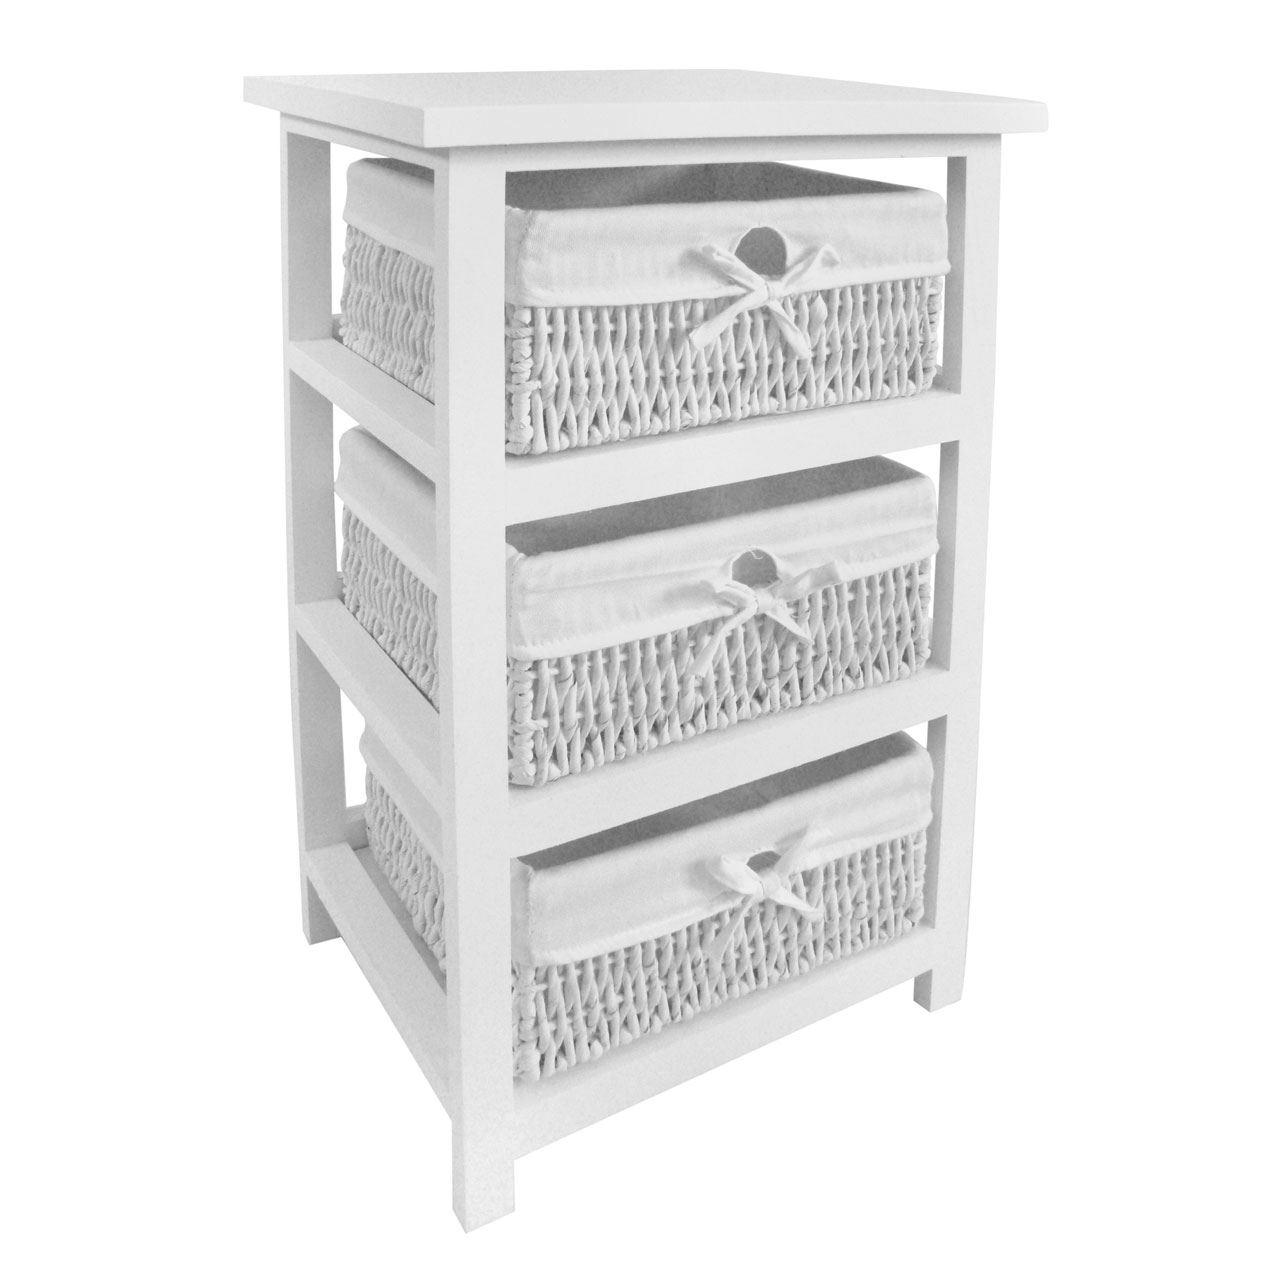 White Storage Unit,3 Maize Baskets With Cotton Liners,Paulownia Wood